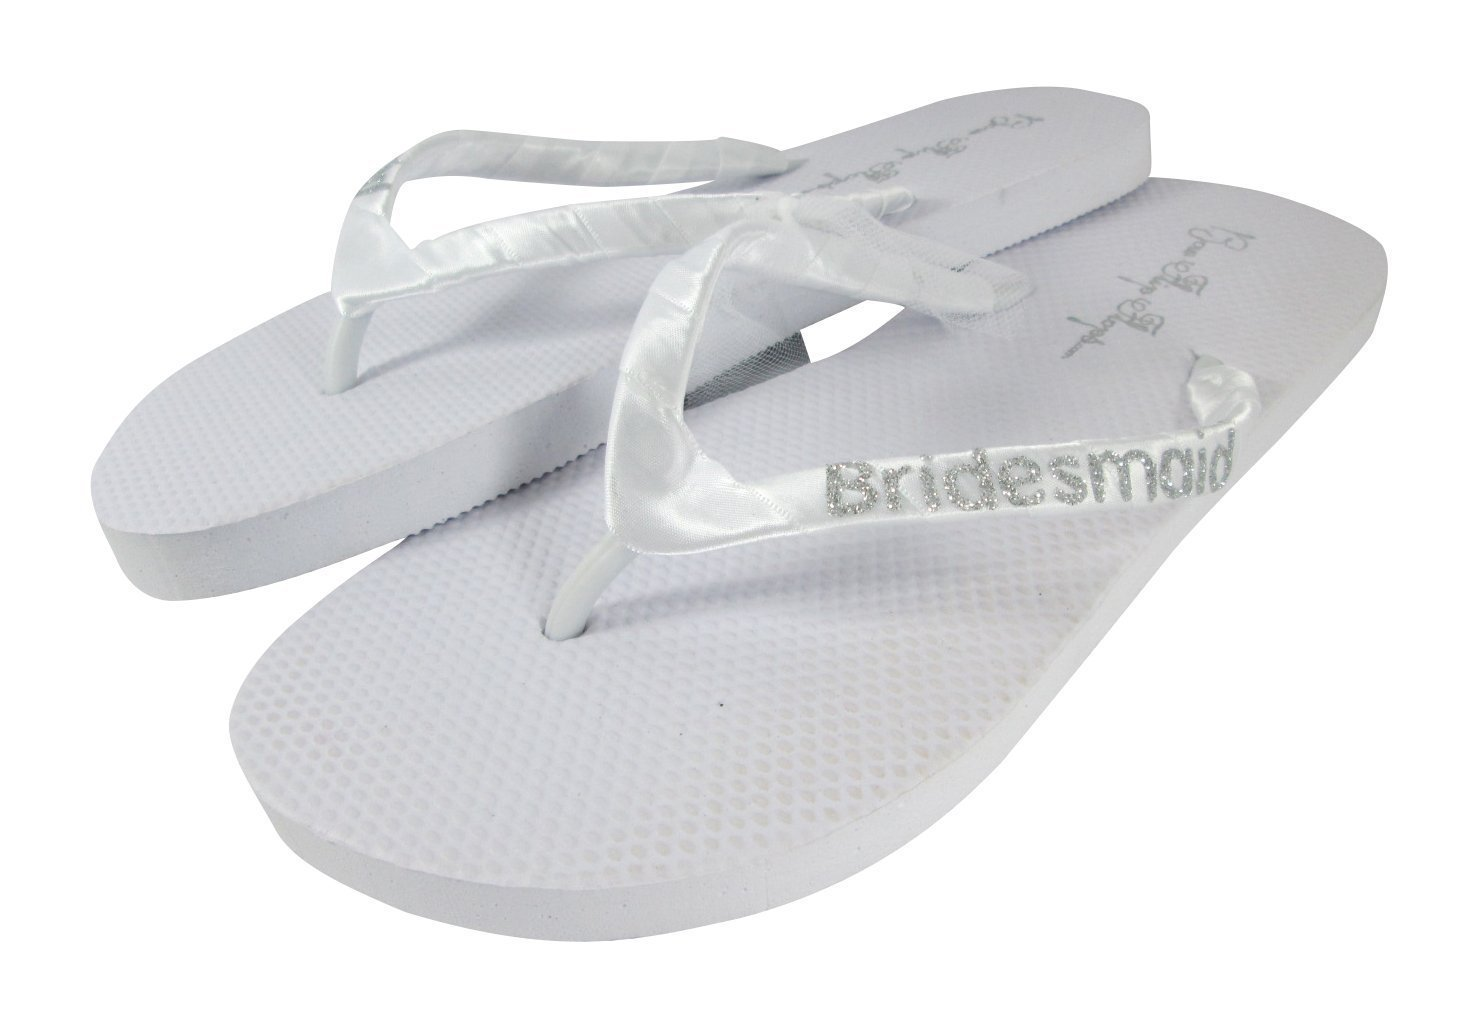 ac79fa8c8 Amazon.com  Bridesmaid Flip Flops Wedding Bling Gift Shower Bridal Bride  Glitter Satin Flip Flops Gold Black Beach Shoes  Handmade